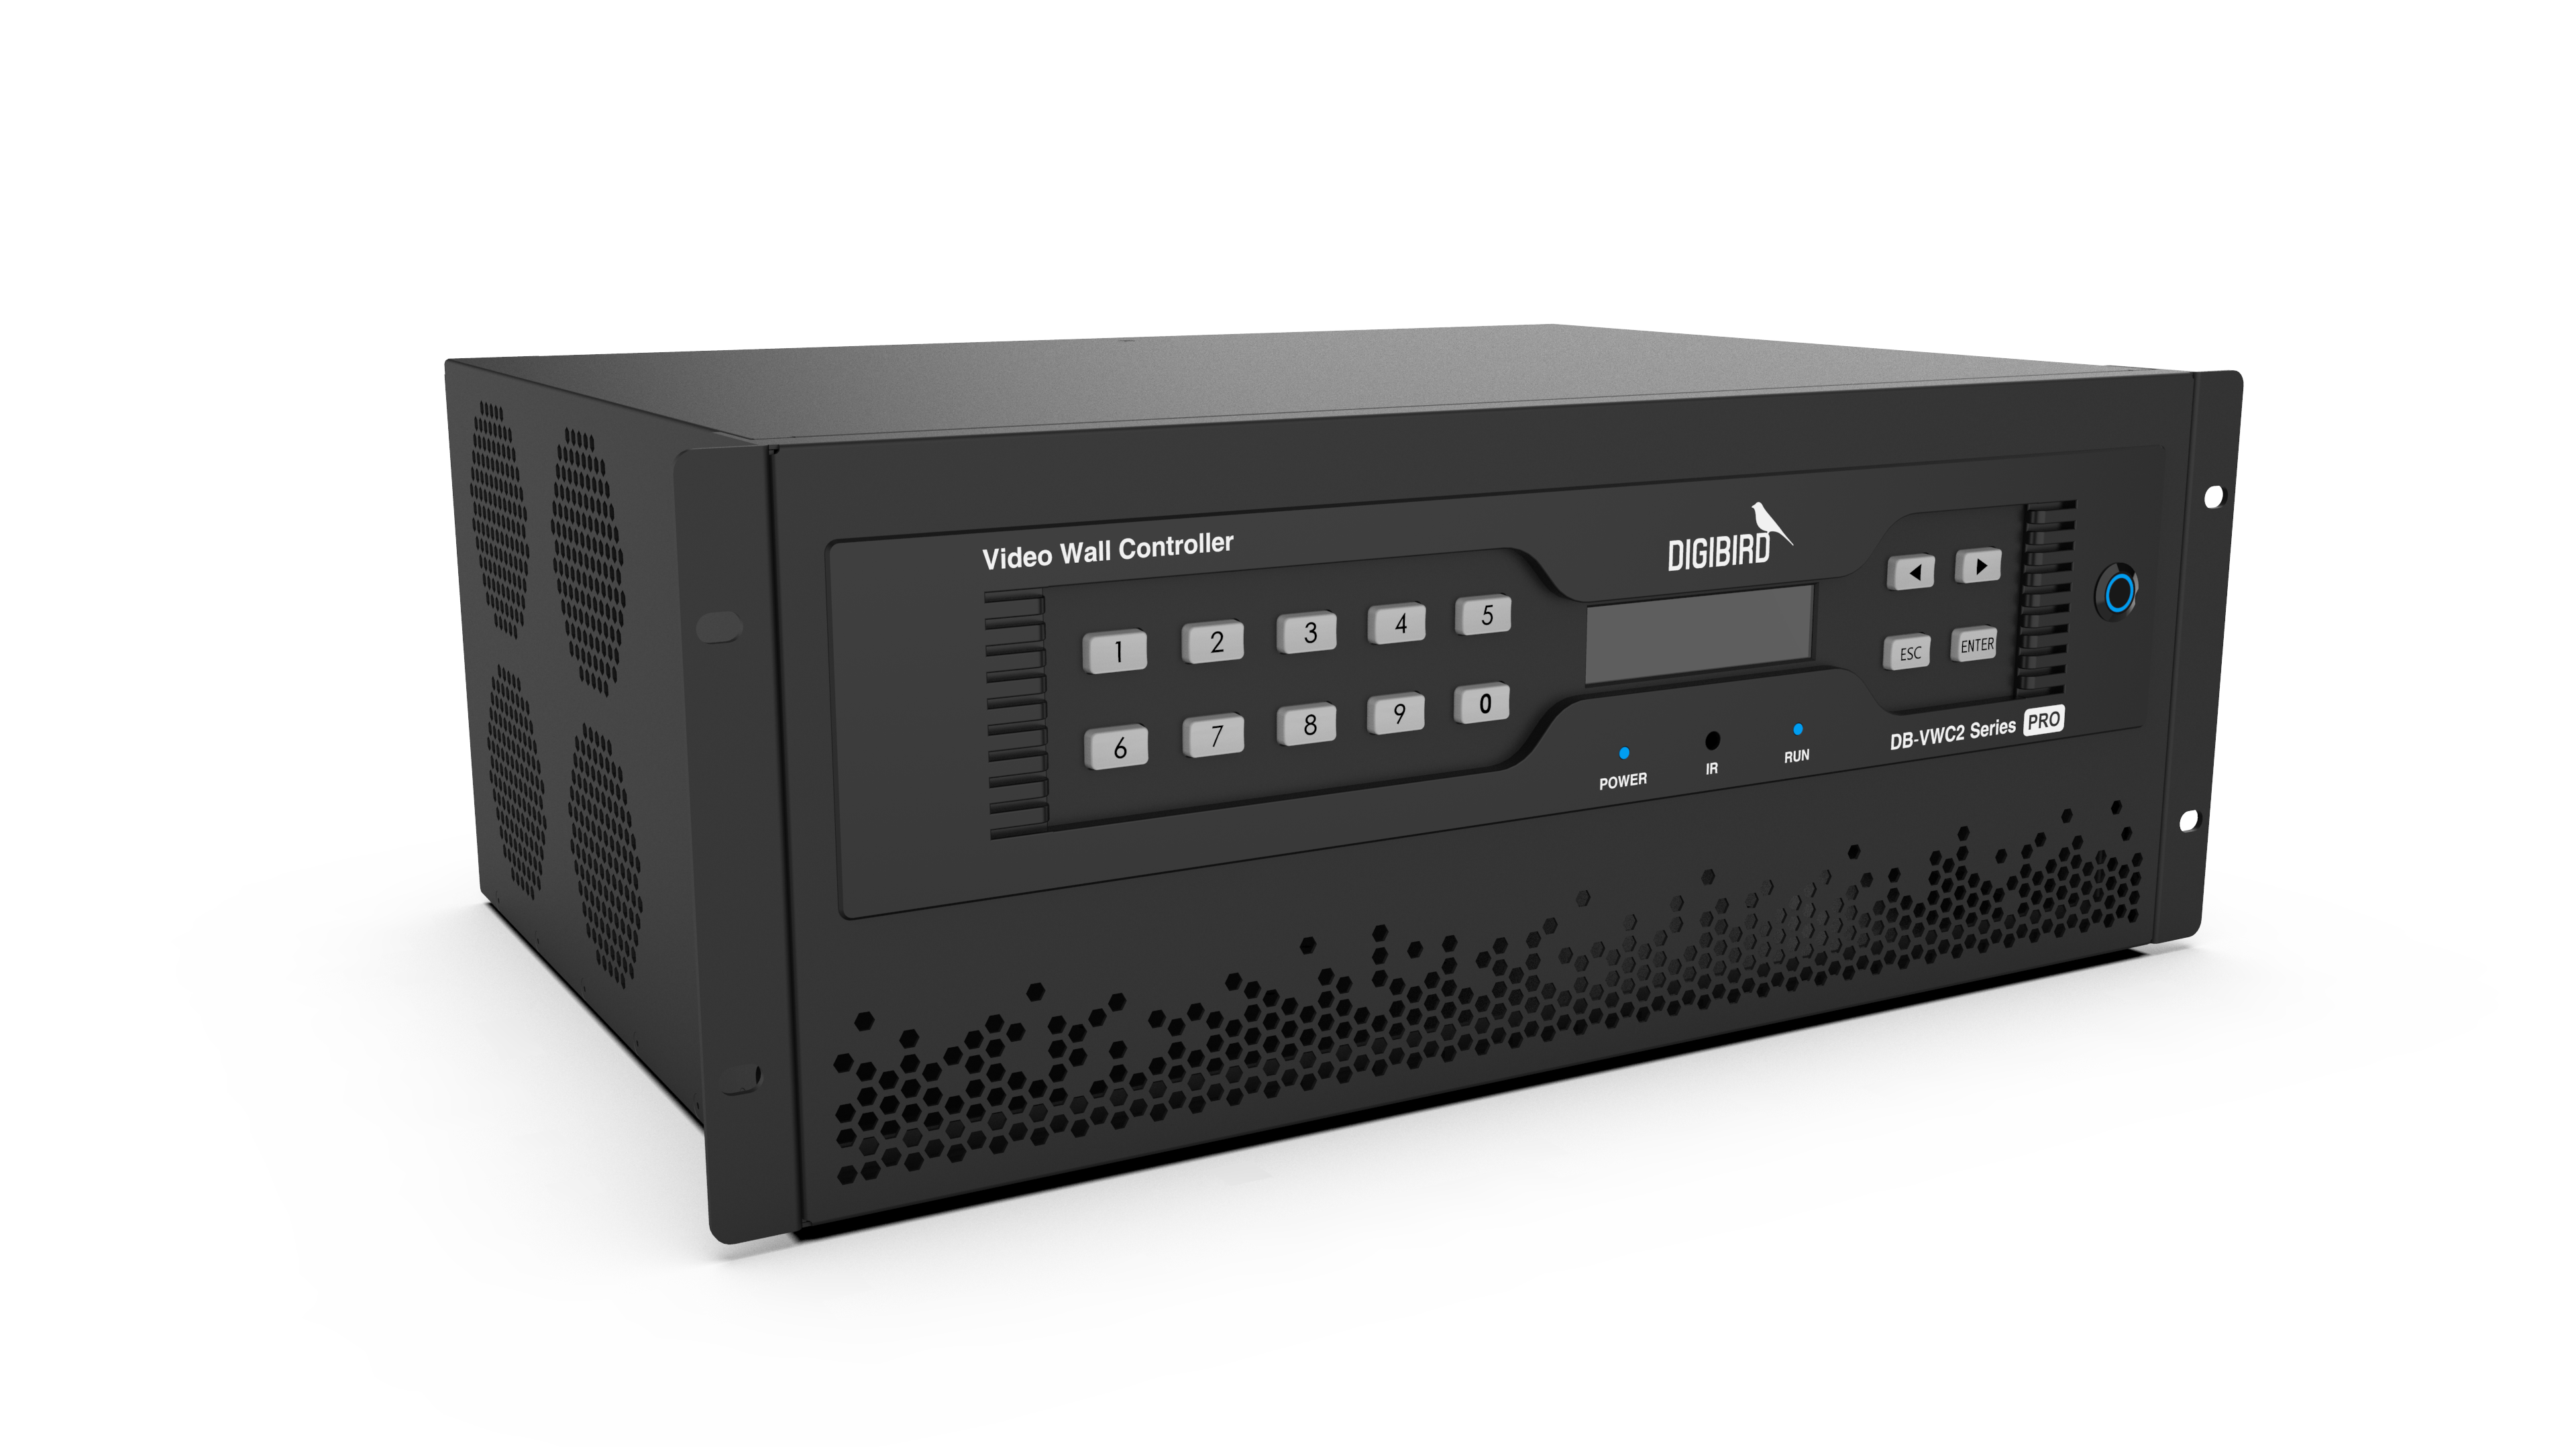 VWC2-HPro Series